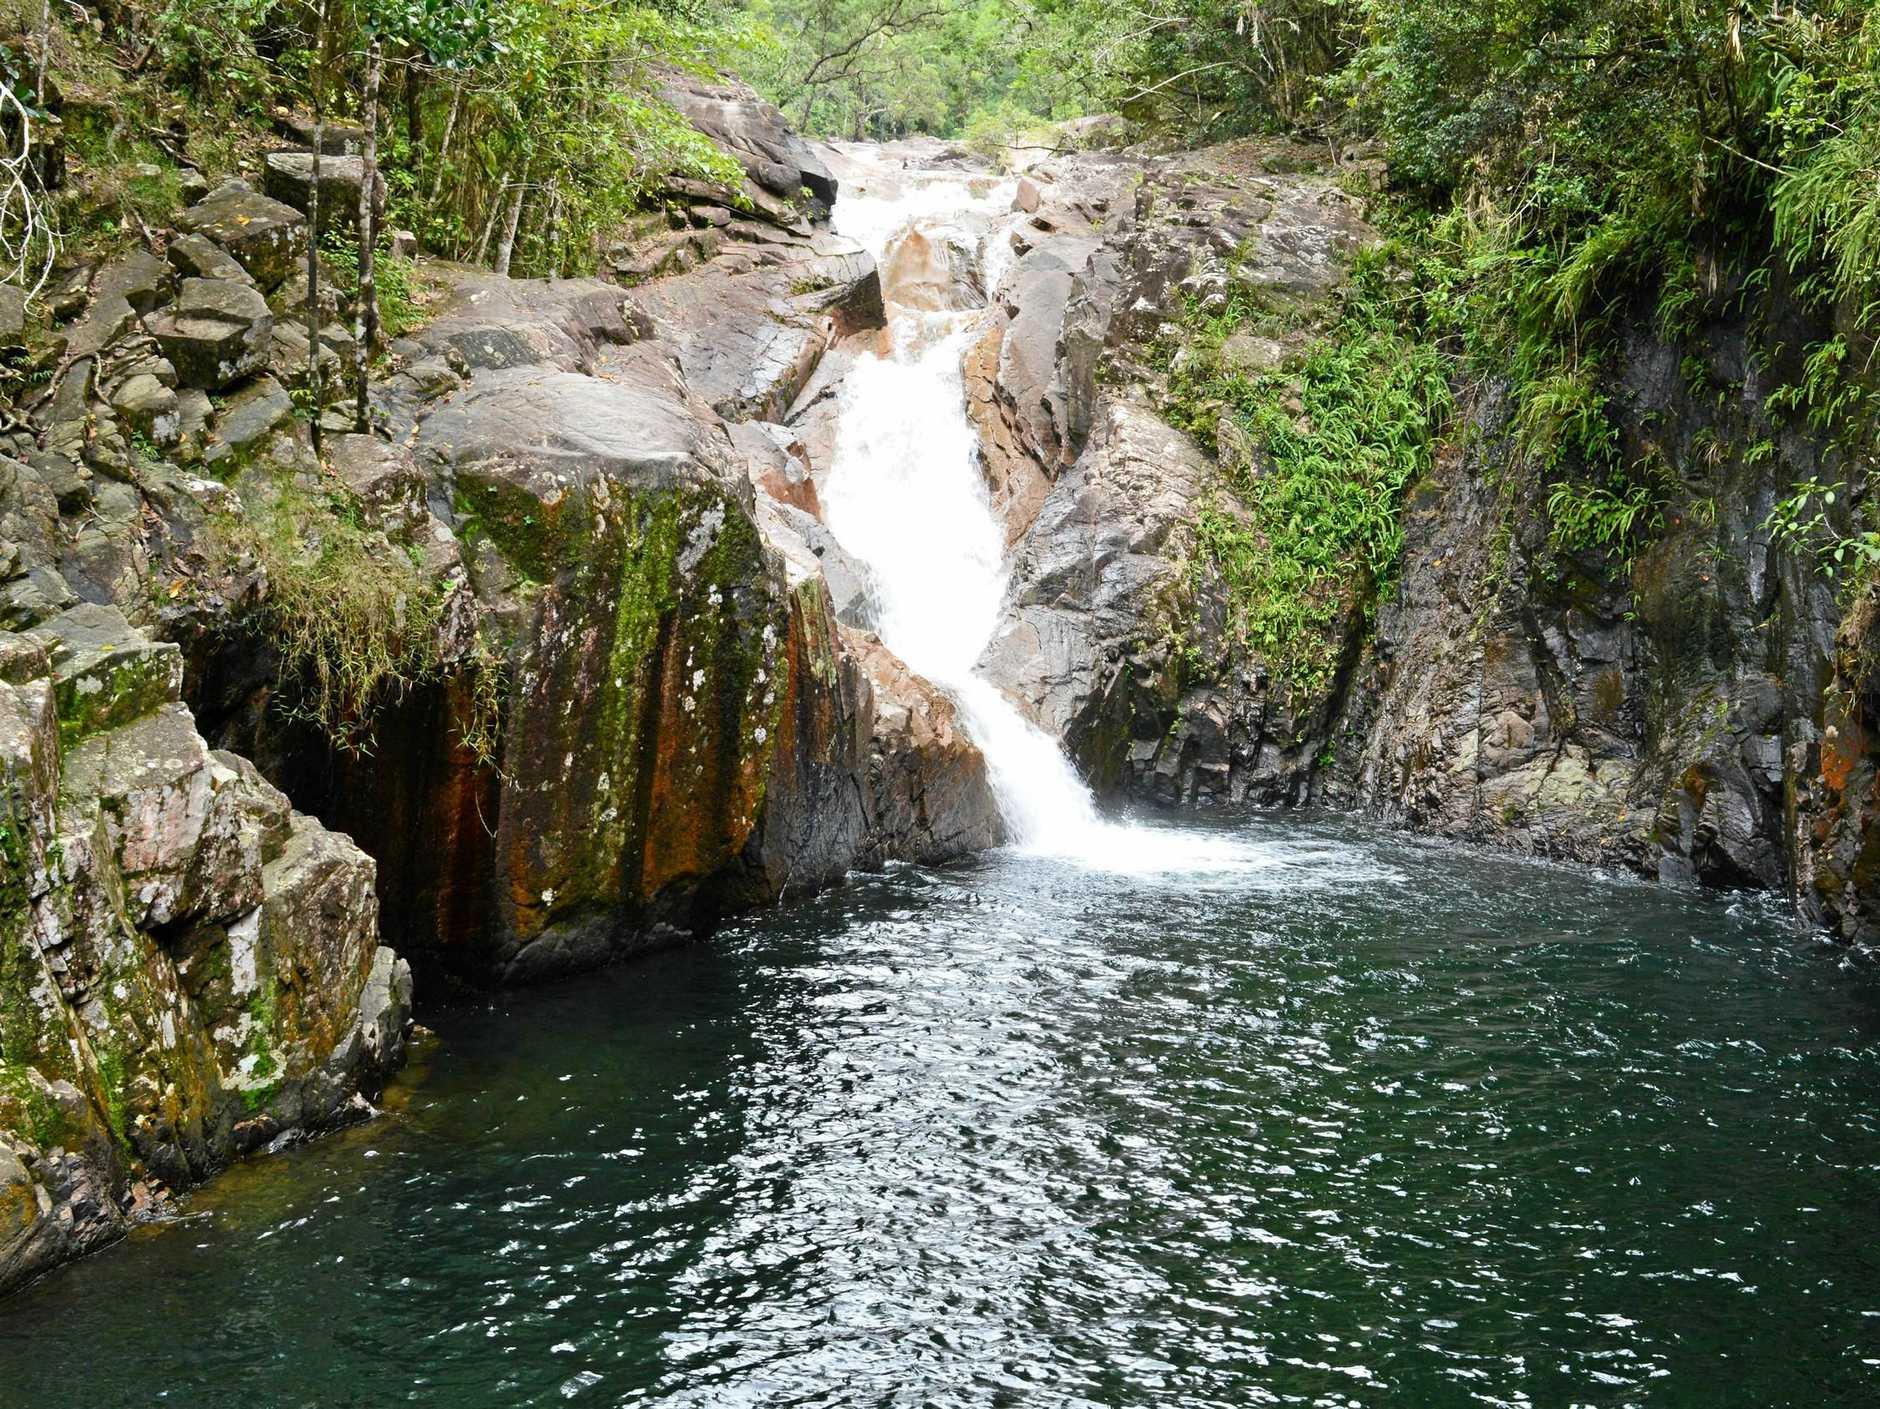 Araluen Falls, a popular swimming hole at Finch Hatton Gorge.